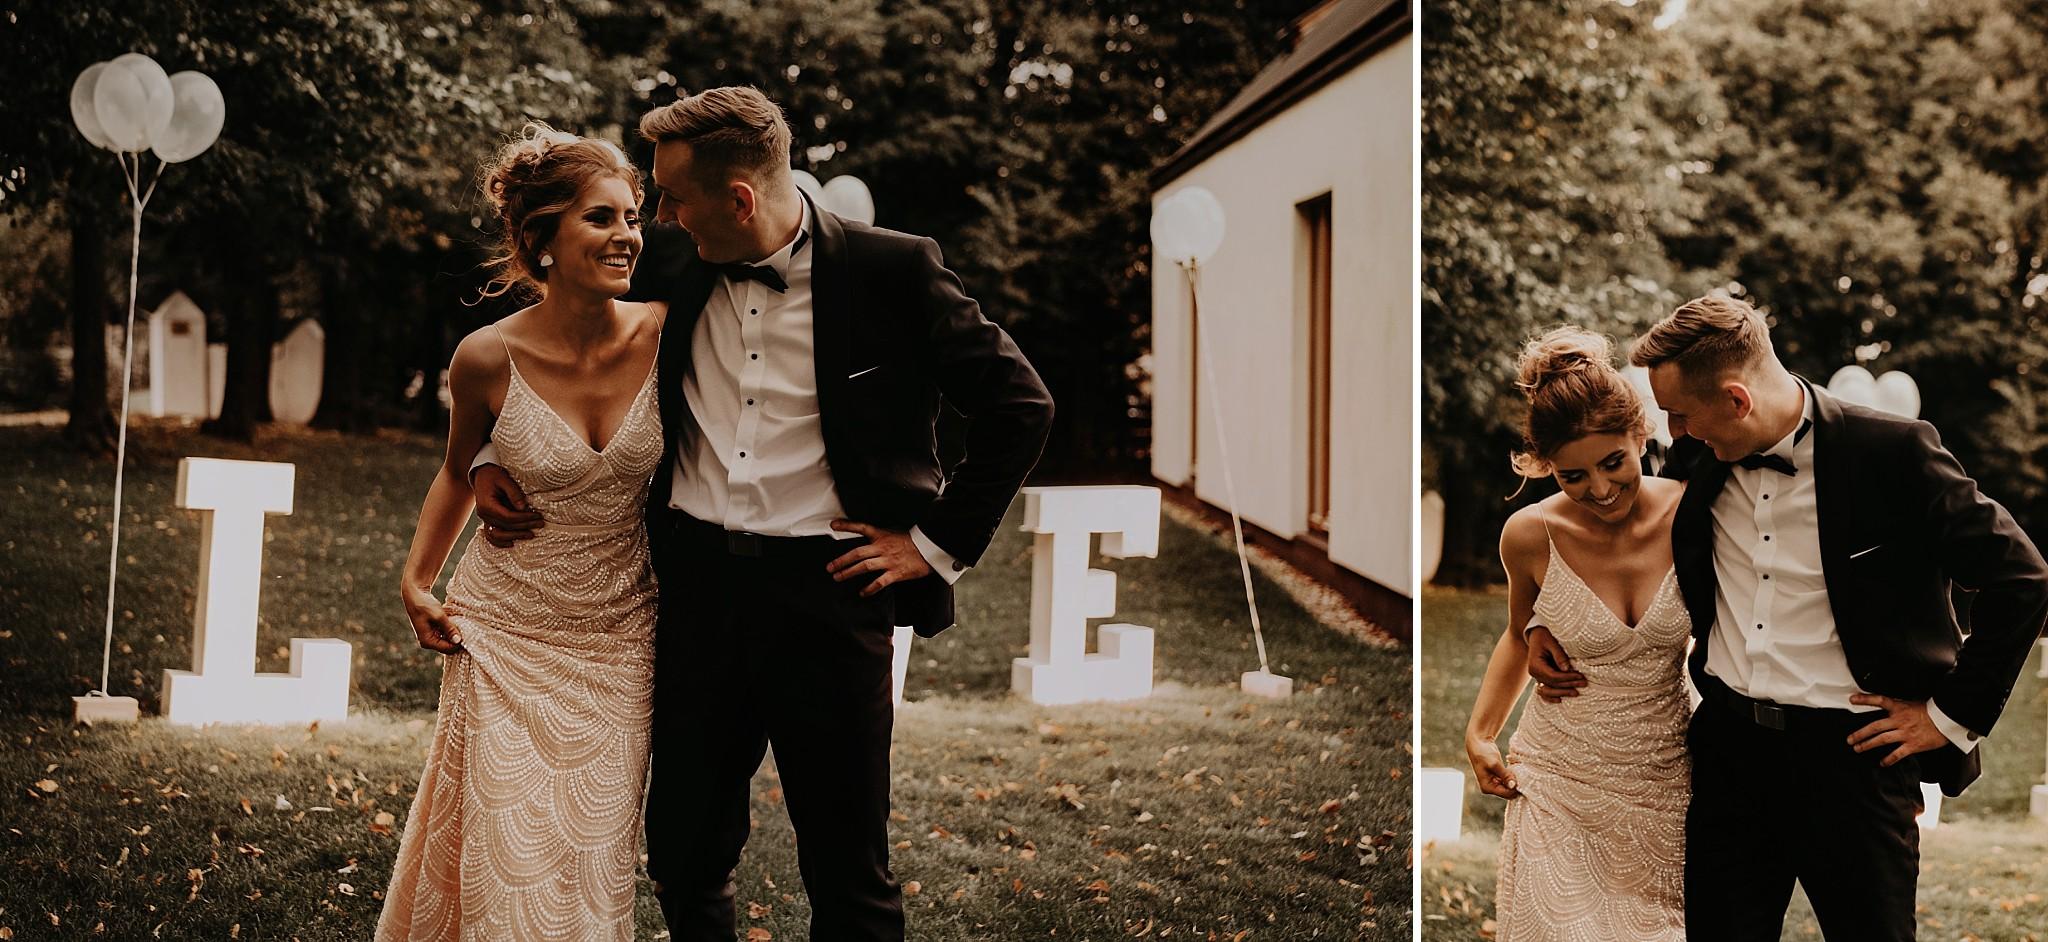 fotograf poznan wesele dobra truskawka piekne wesele pod poznaniem wesele w dobrej truskawce piekna para mloda slub marzen slub koronawirus slub listopad wesele koronawirus 355